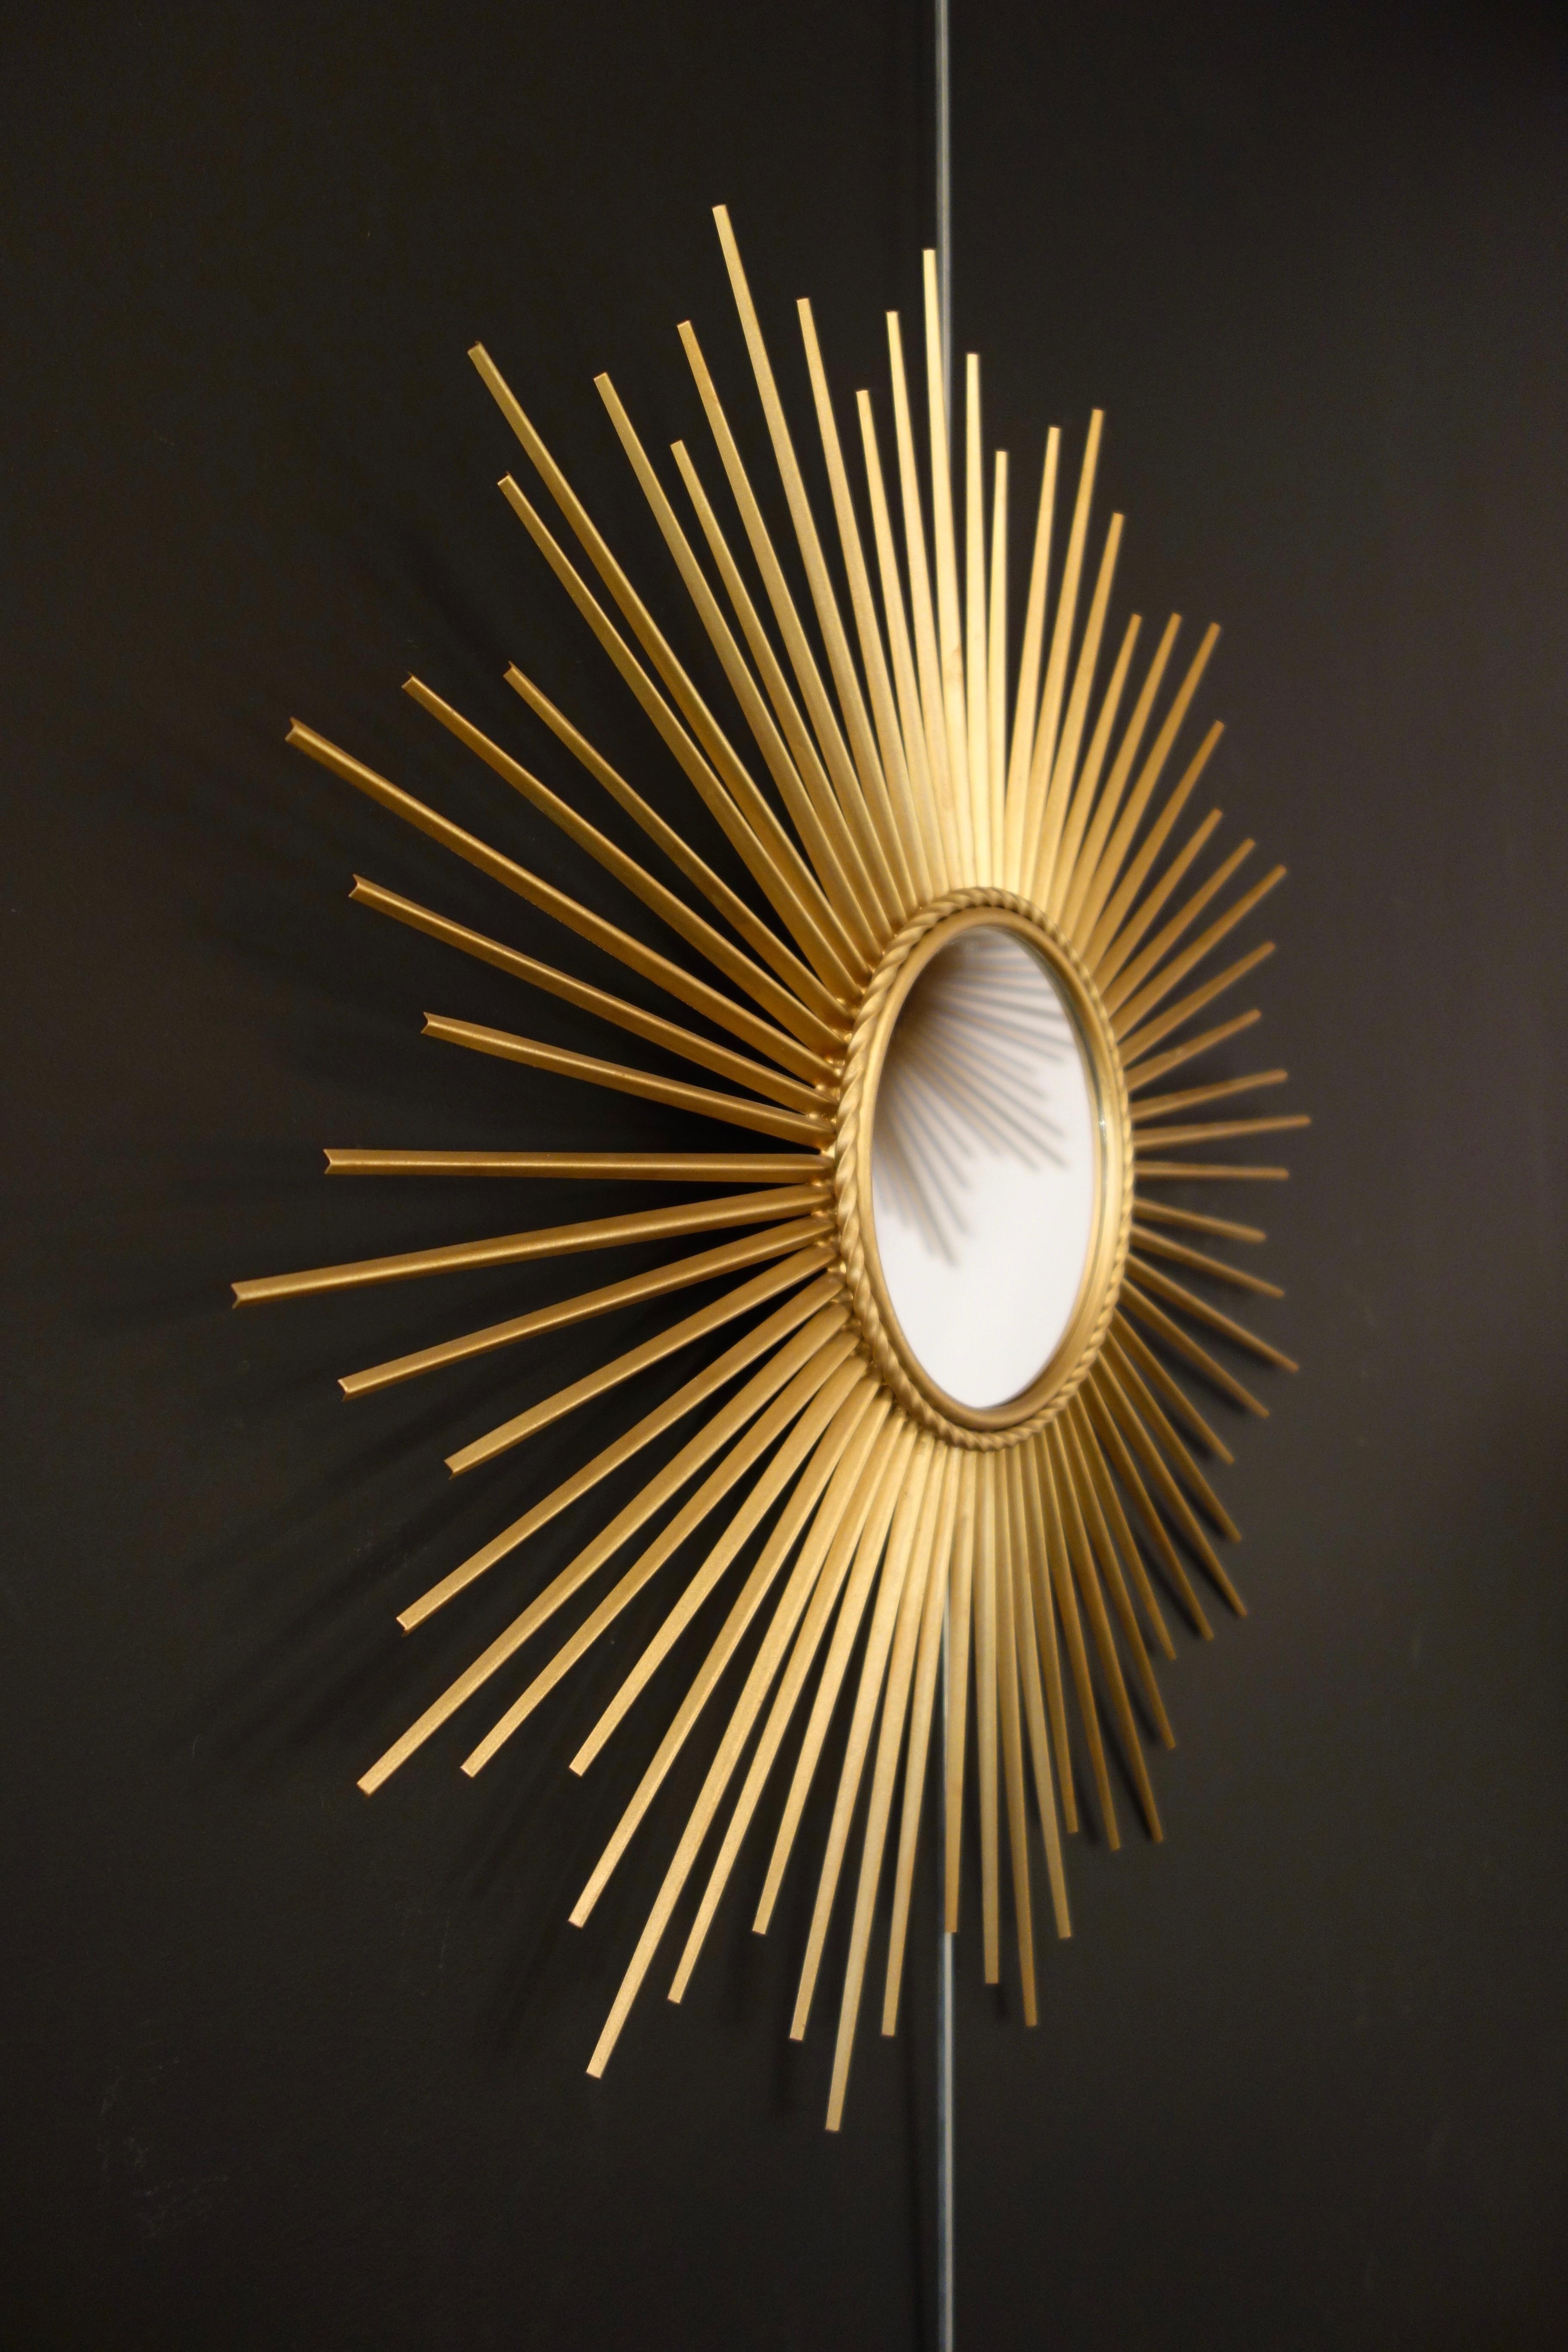 Miroir soleil vintage CHATY VALLAURIS année 50 60